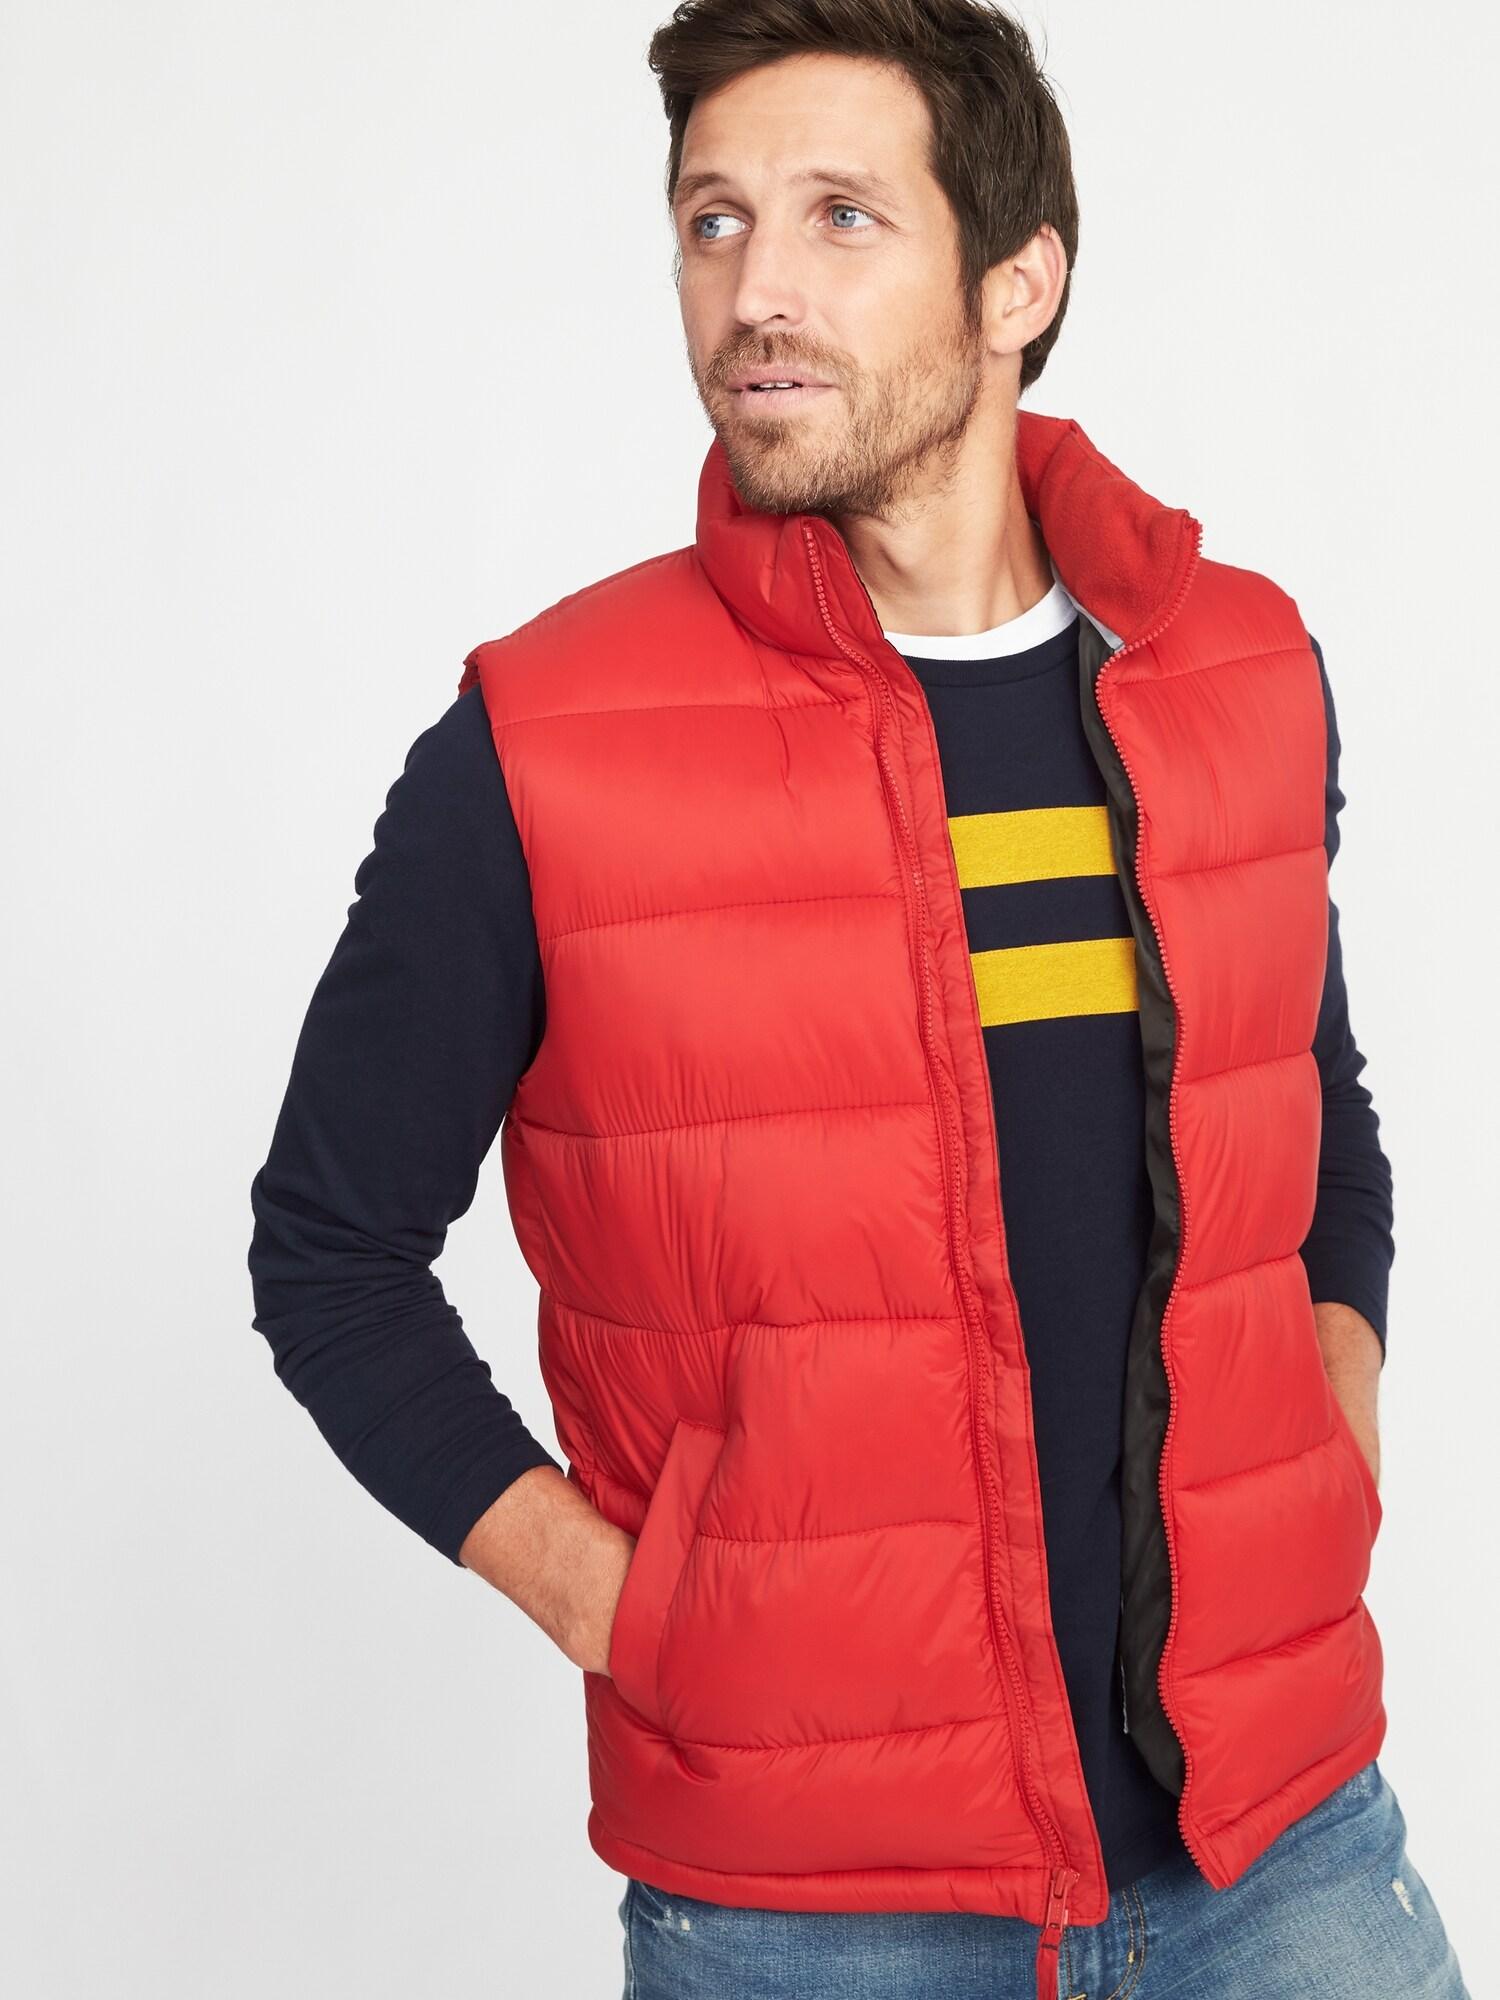 9eac02de6eae Frost-Free Puffer Vest for Men